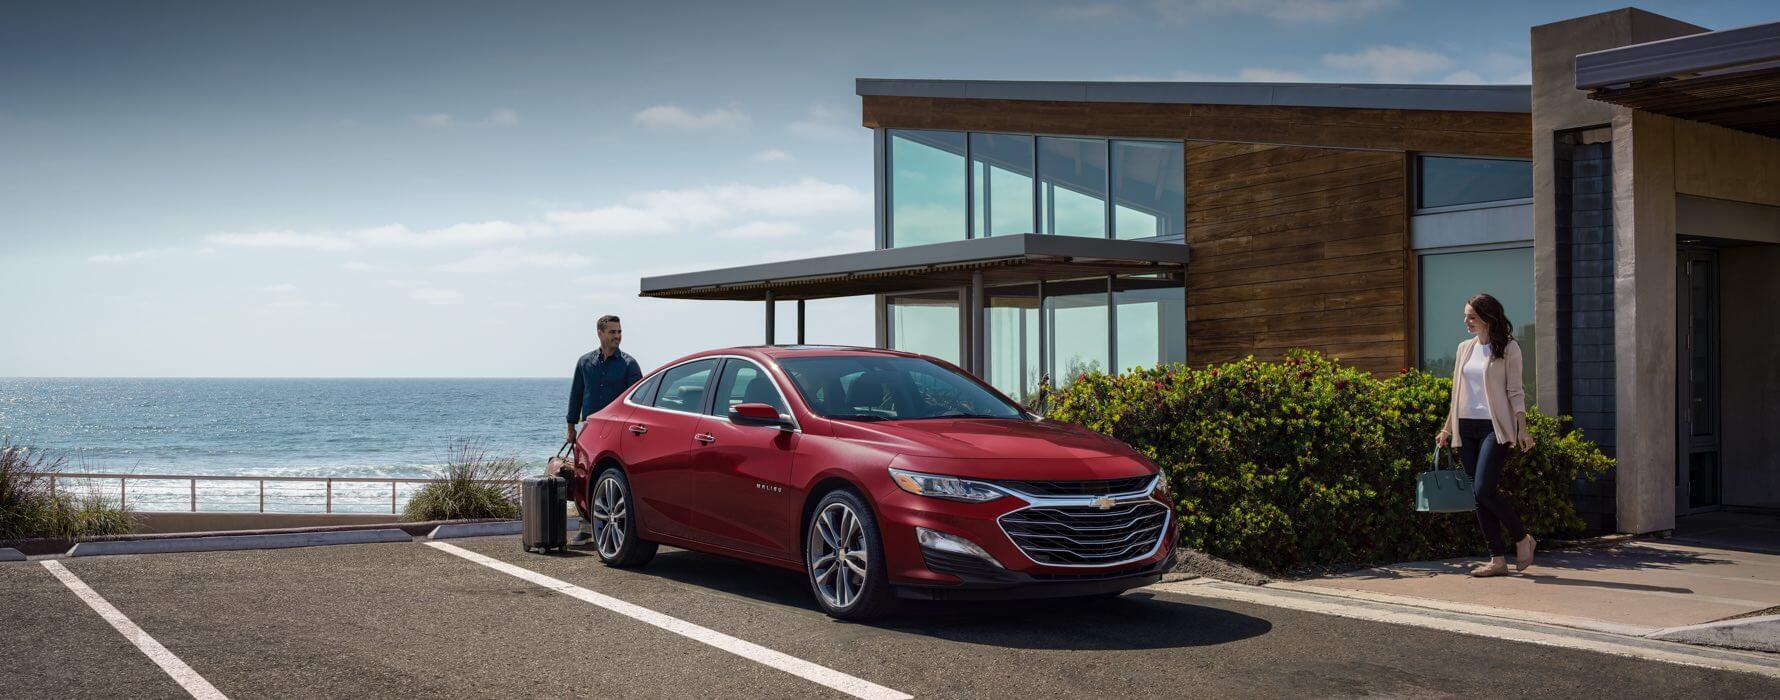 Chevrolet Malibu Model LS vs LT Trim Levels (2019) | What's